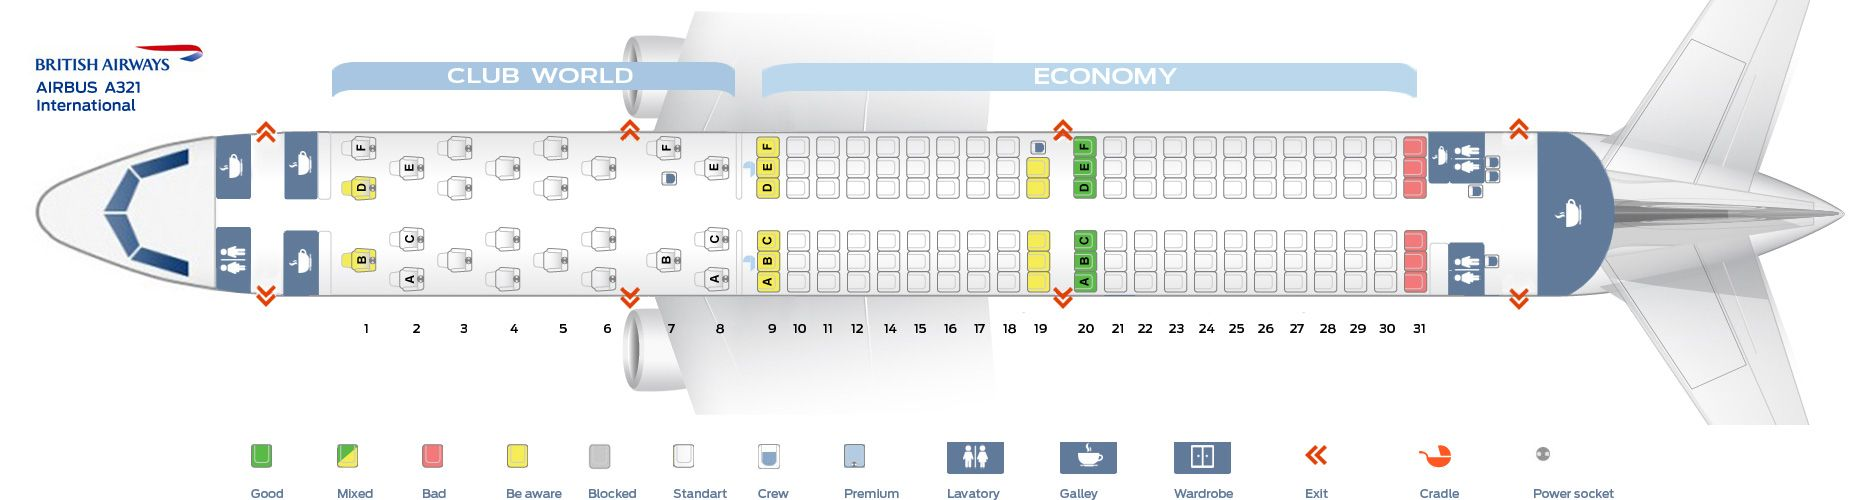 British Airways Fleet Airbus A321 200 Details And Pictures